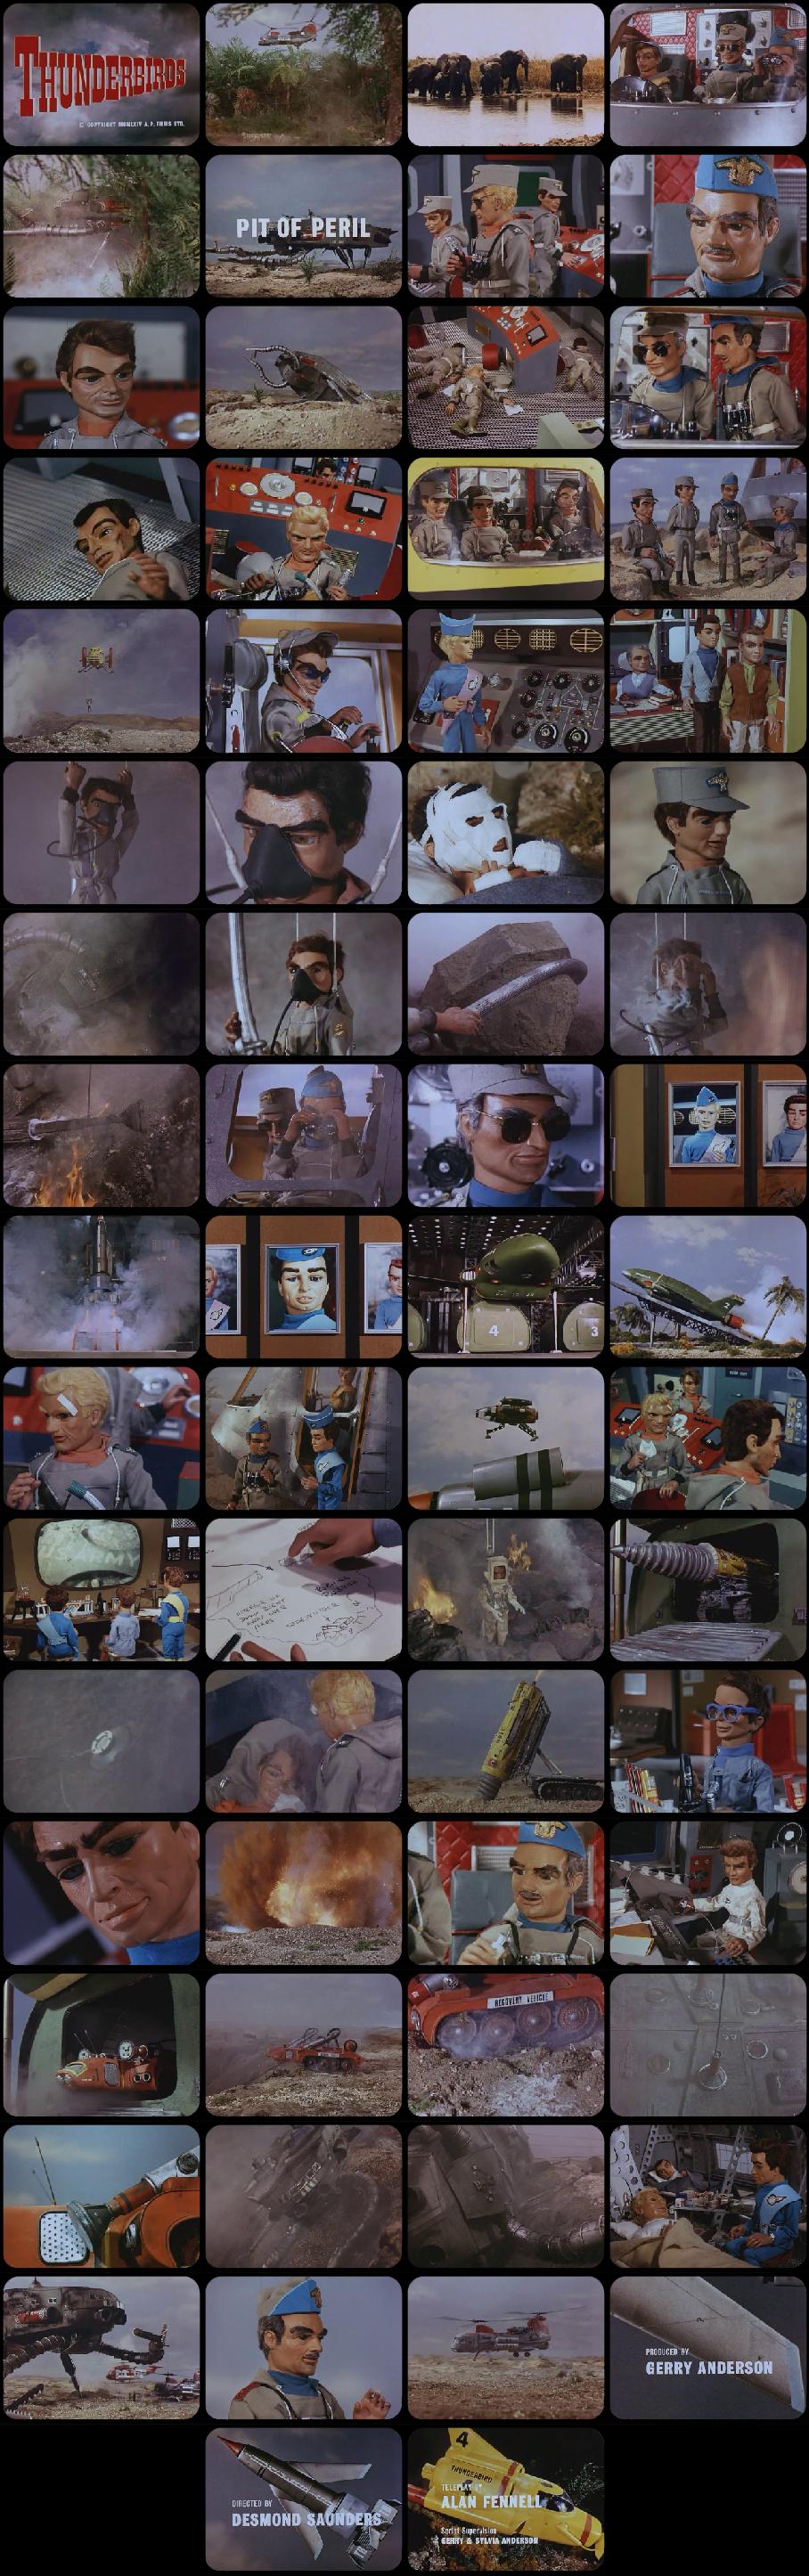 Thunderbirds Episode 2 Tele-Snaps